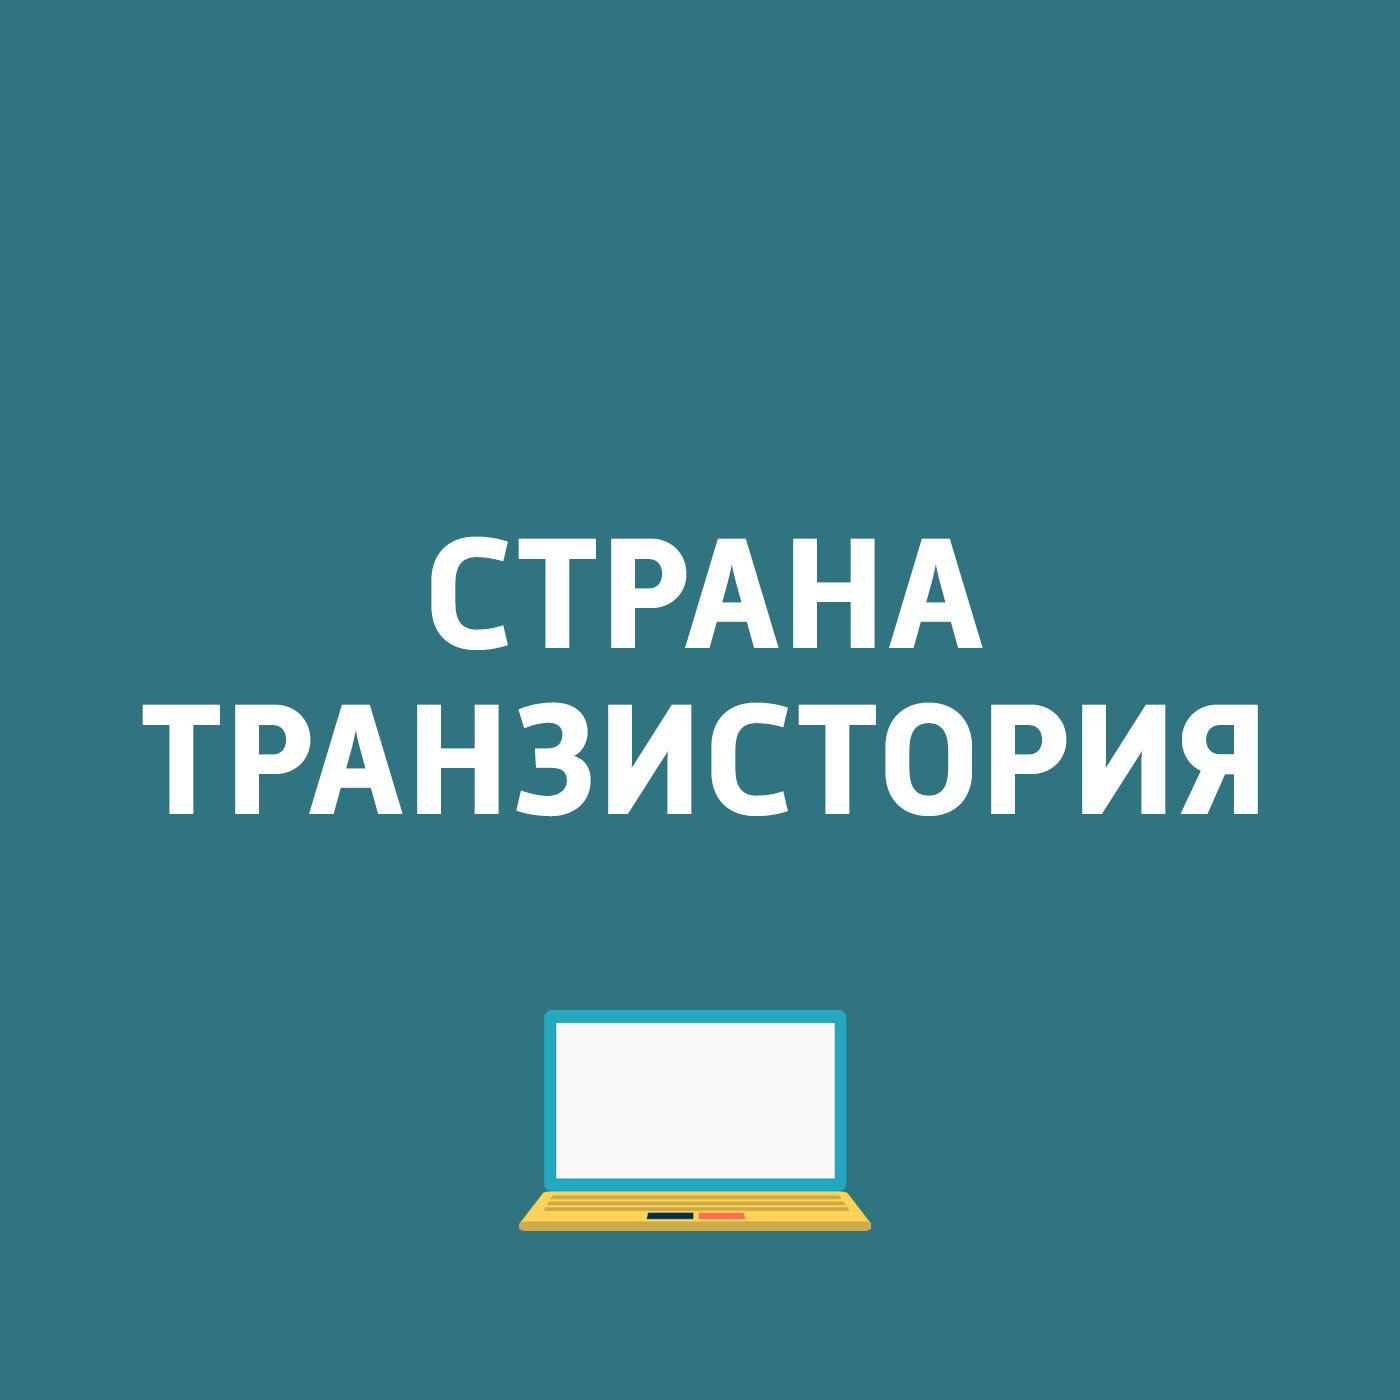 Картаев Павел Тест-драйв Hyundai Solaris от Павла Картаева по Пушкинским местам цена и фото